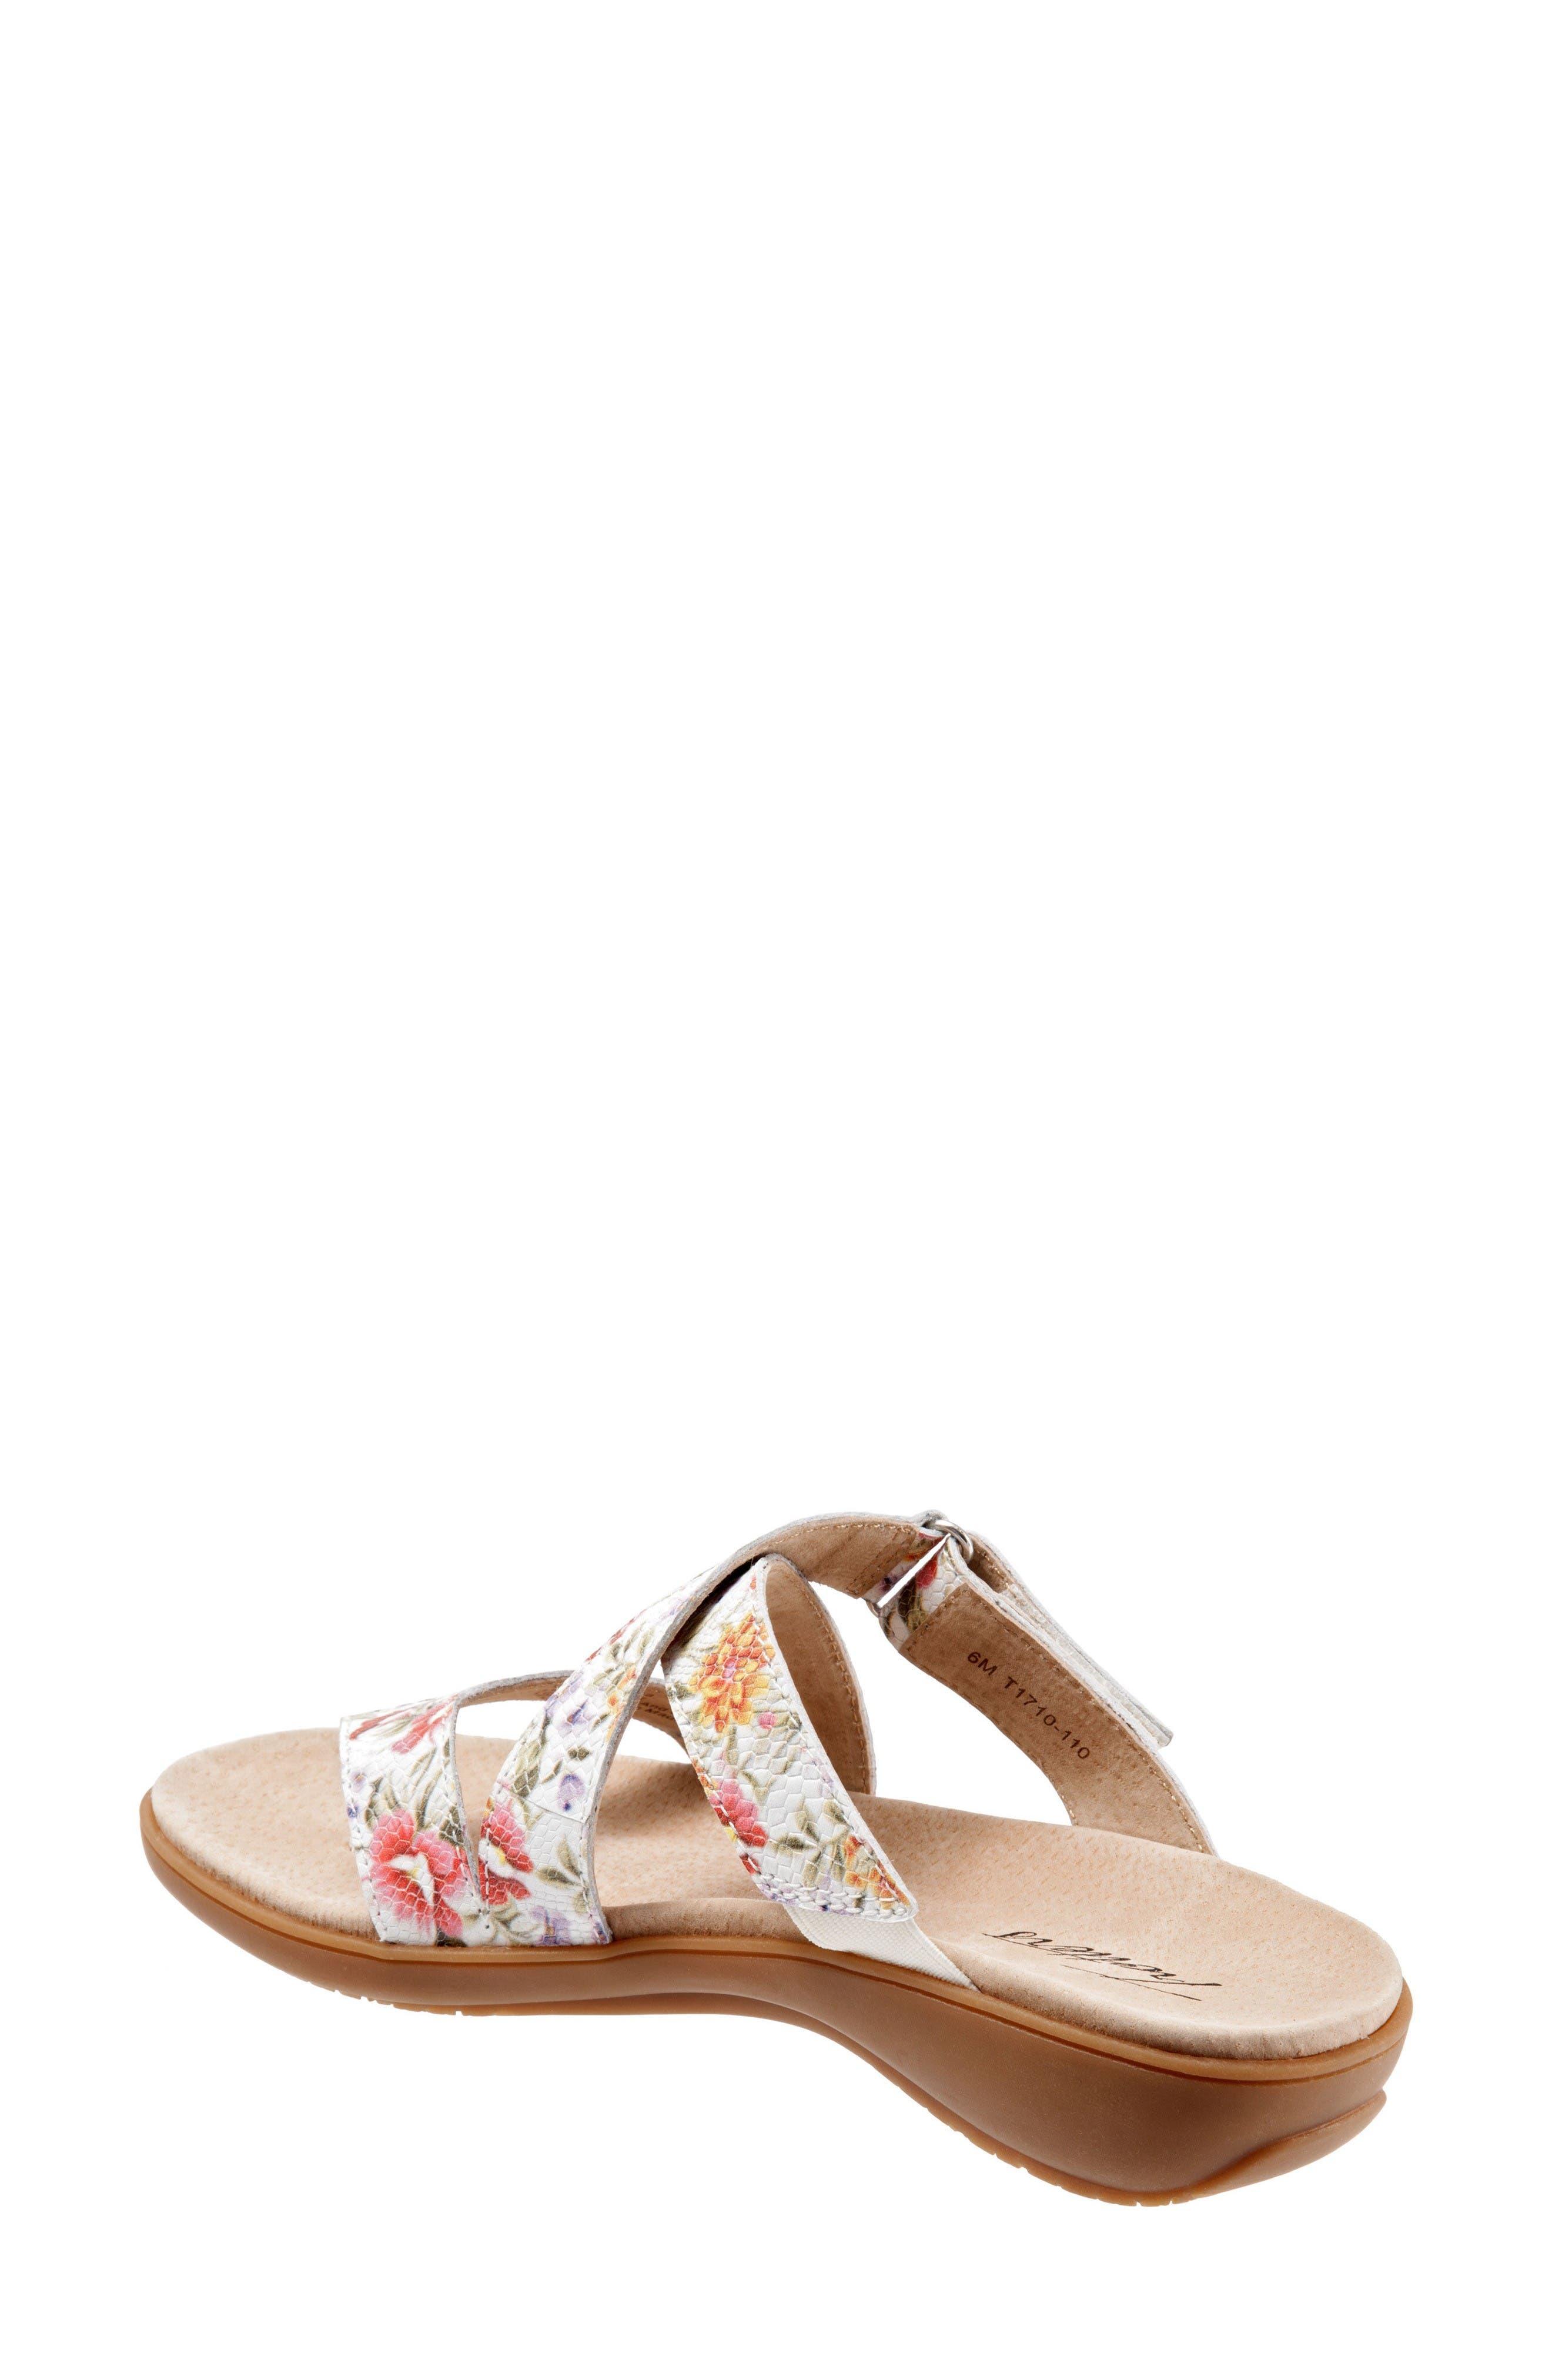 Komet Thong Sandal,                             Alternate thumbnail 2, color,                             Off White Floral Leather